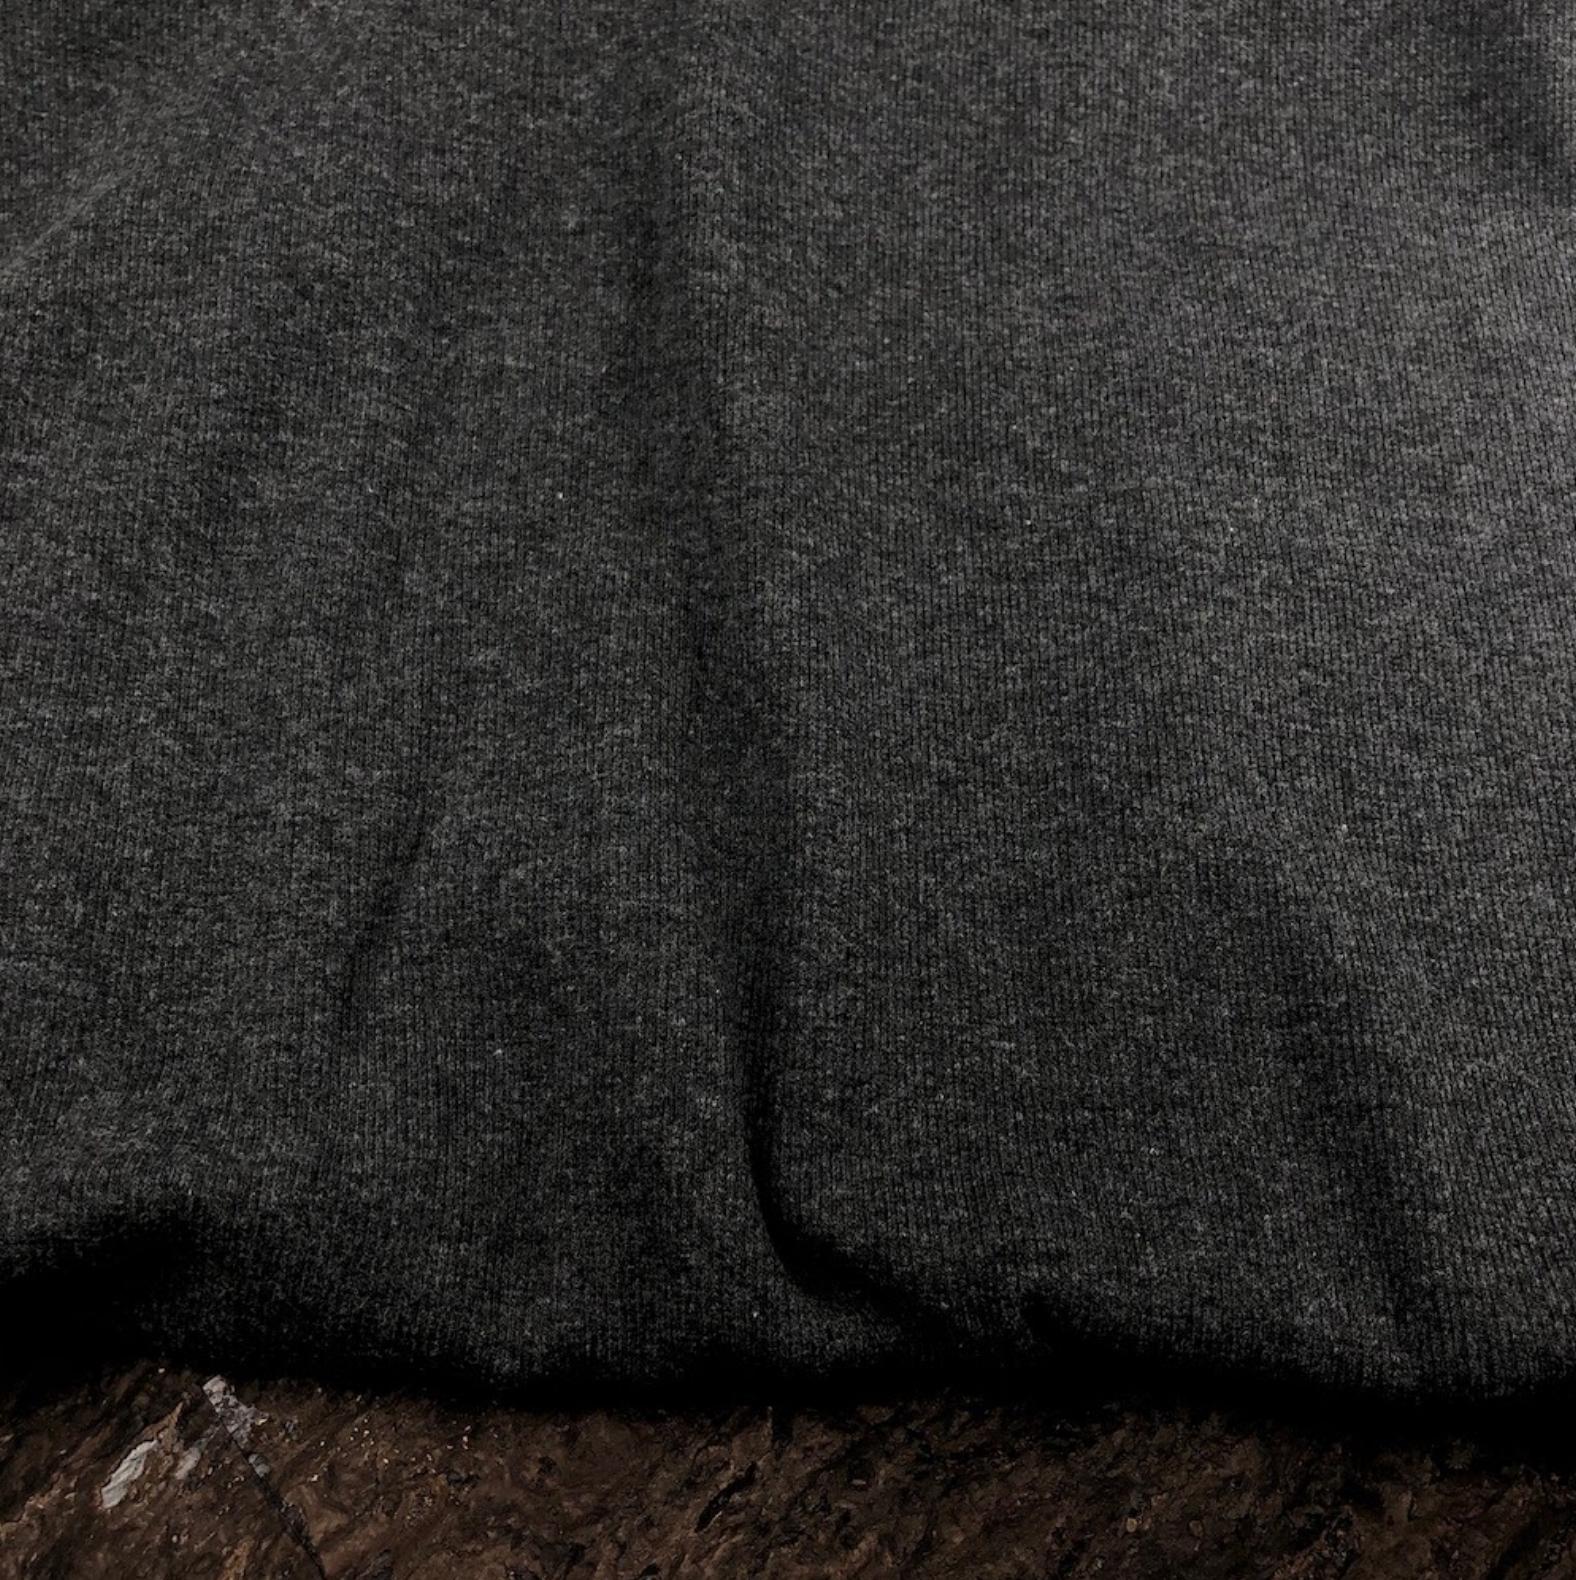 Bamboo Cotton 2x2 Rib Knit - Charcoal Mix - Kendor